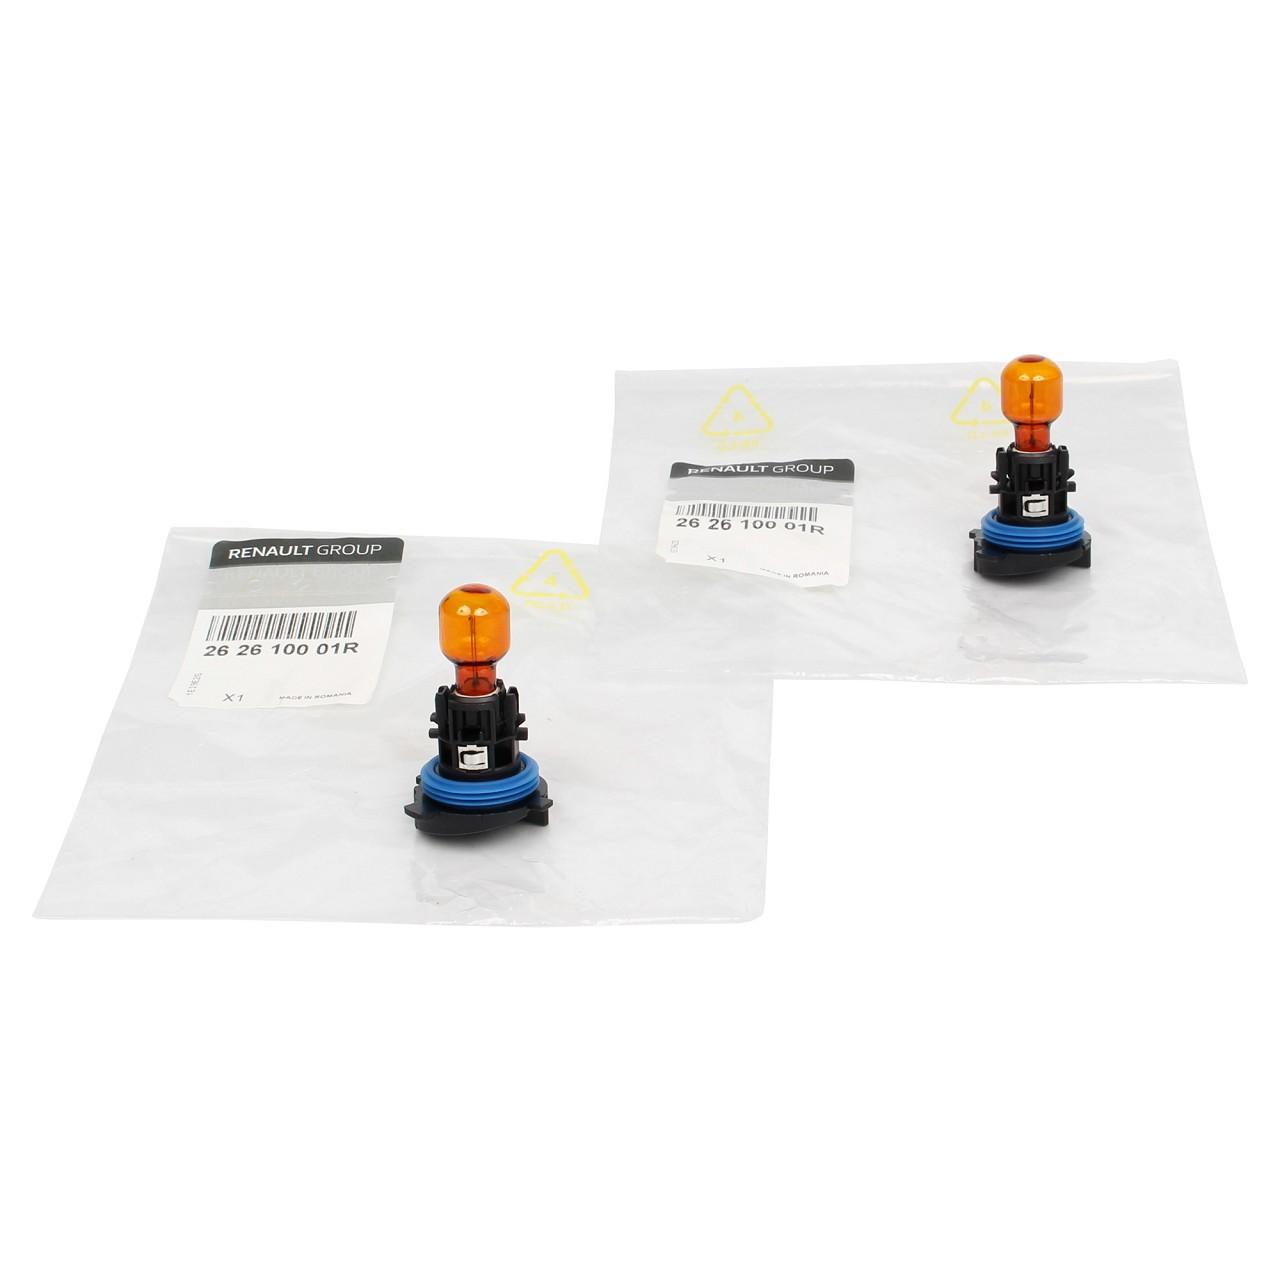 2x ORIGINAL Renault Glühlampe Halogenlampe P24W ORANGE 12V 24W HP24WA 262610001R